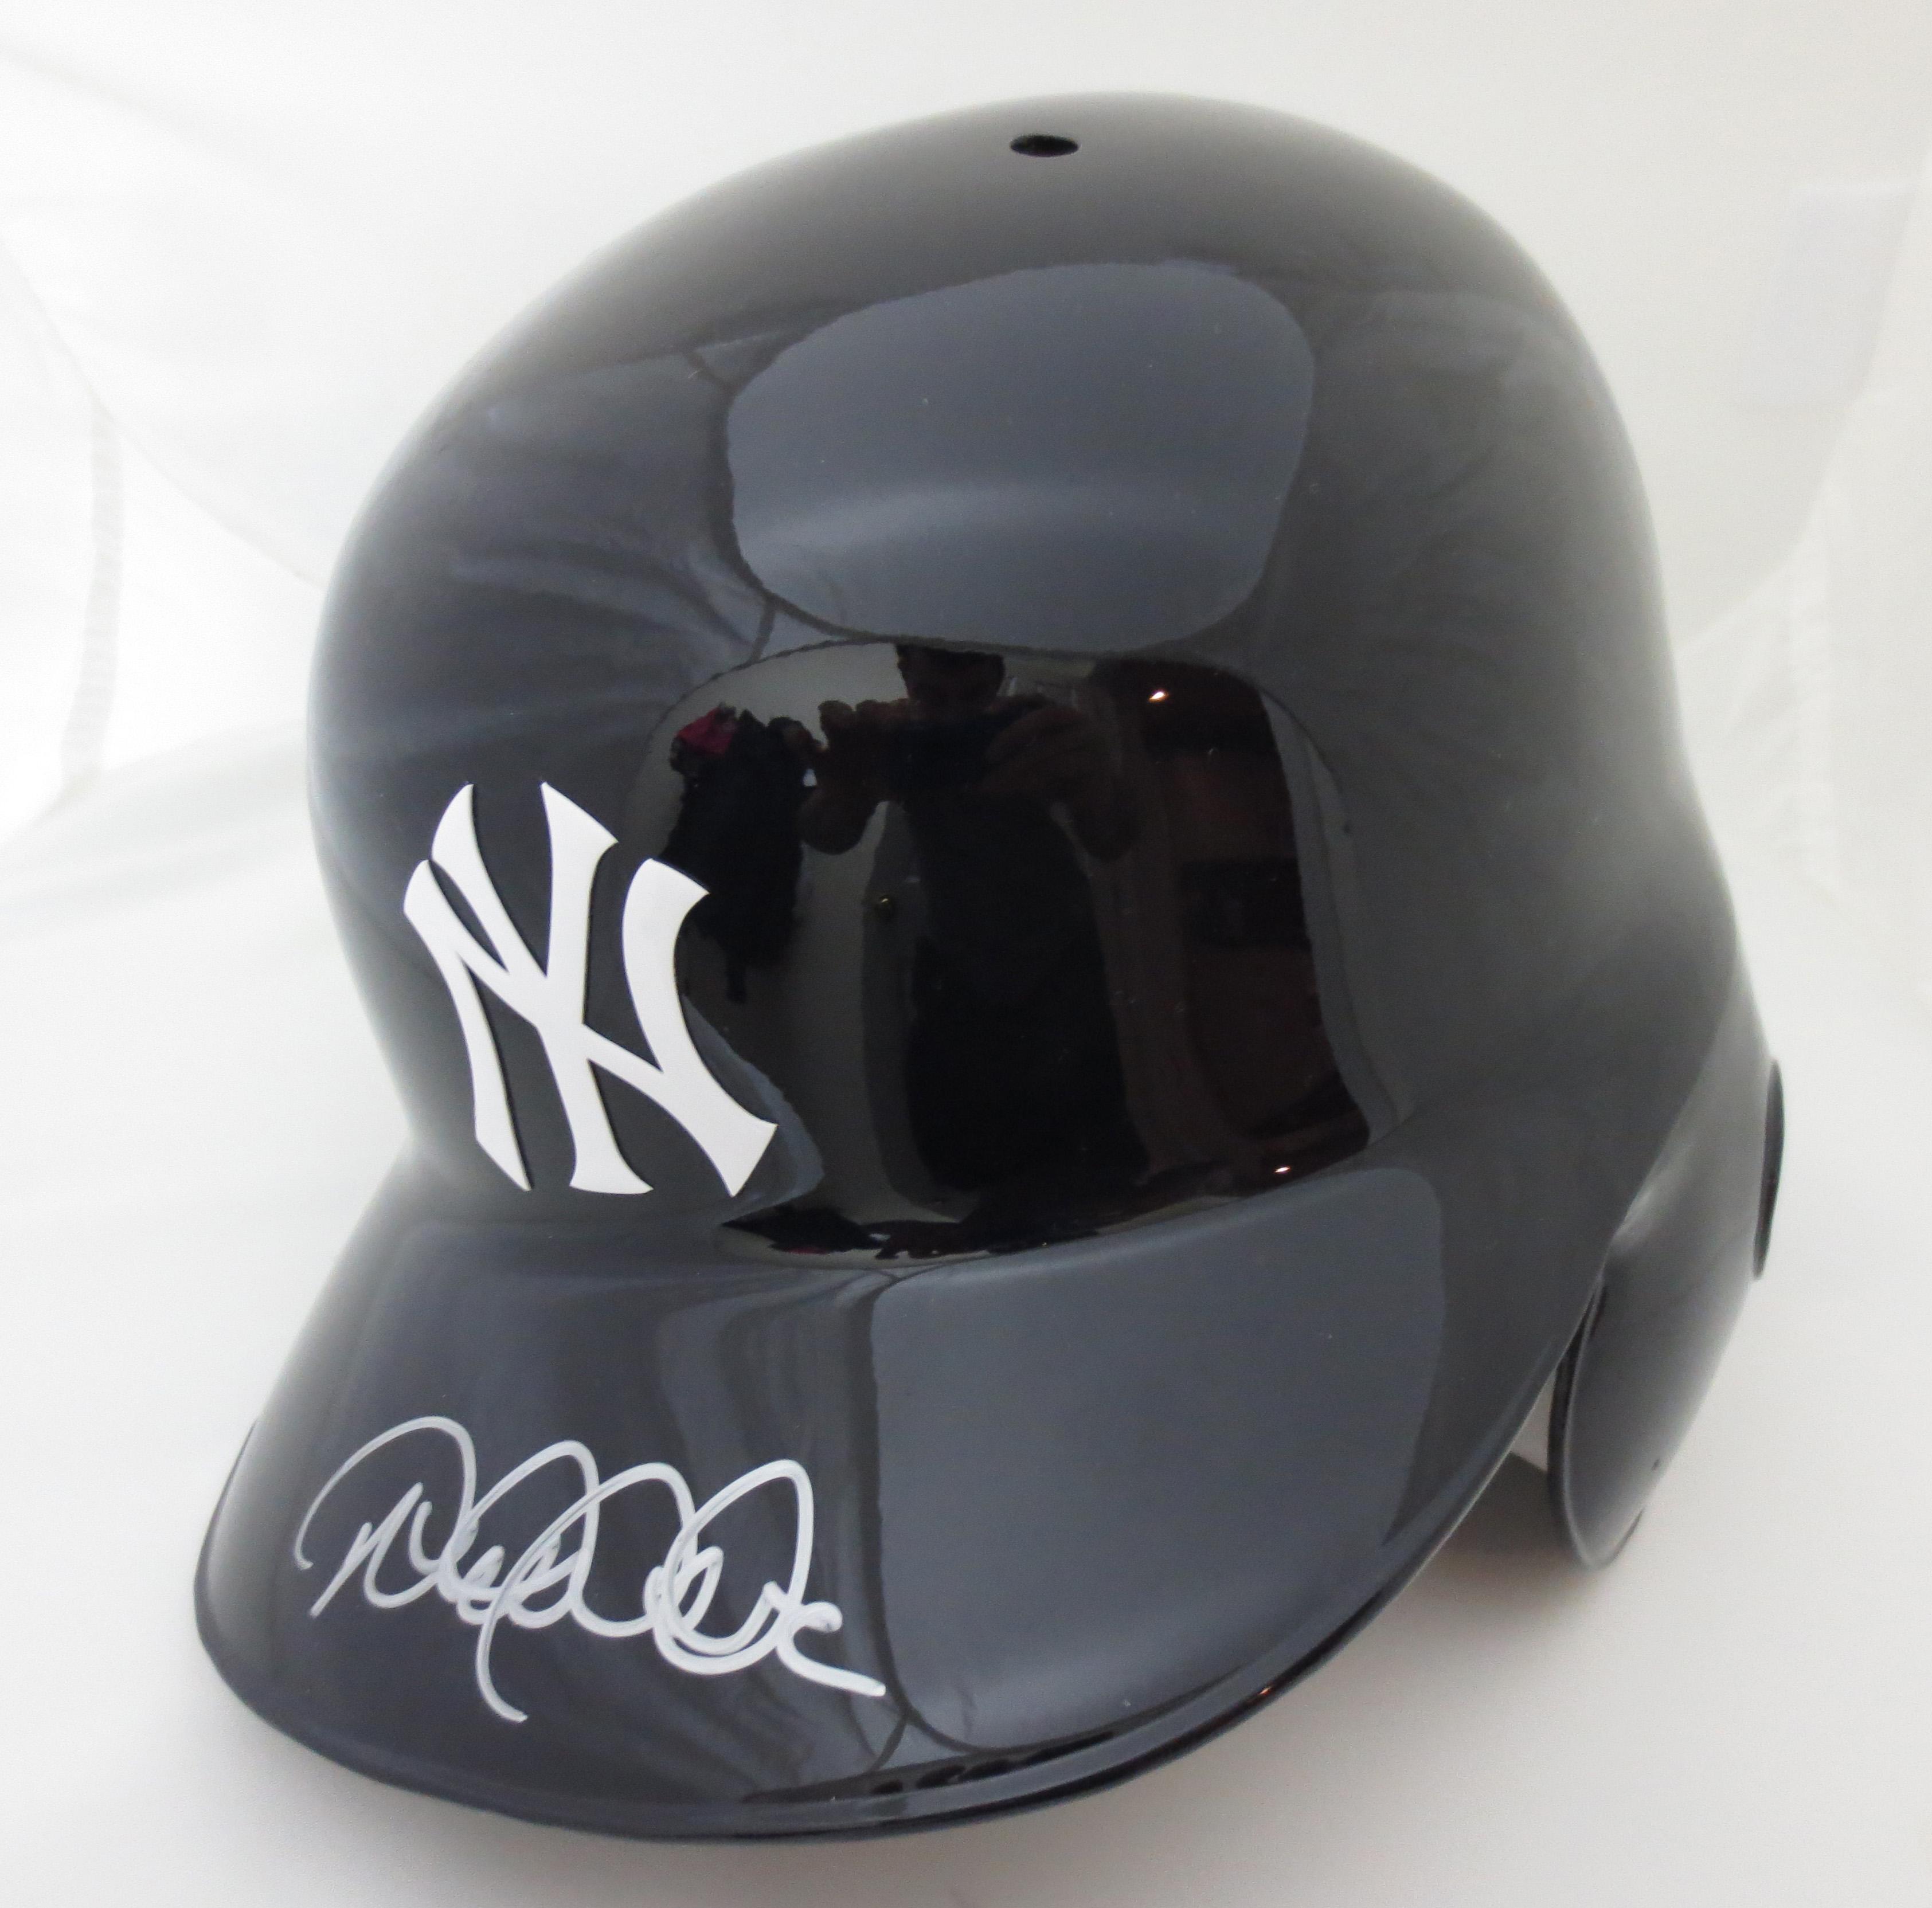 Derek Jeter Autographed Yankees Batting Helmet from Powers ...